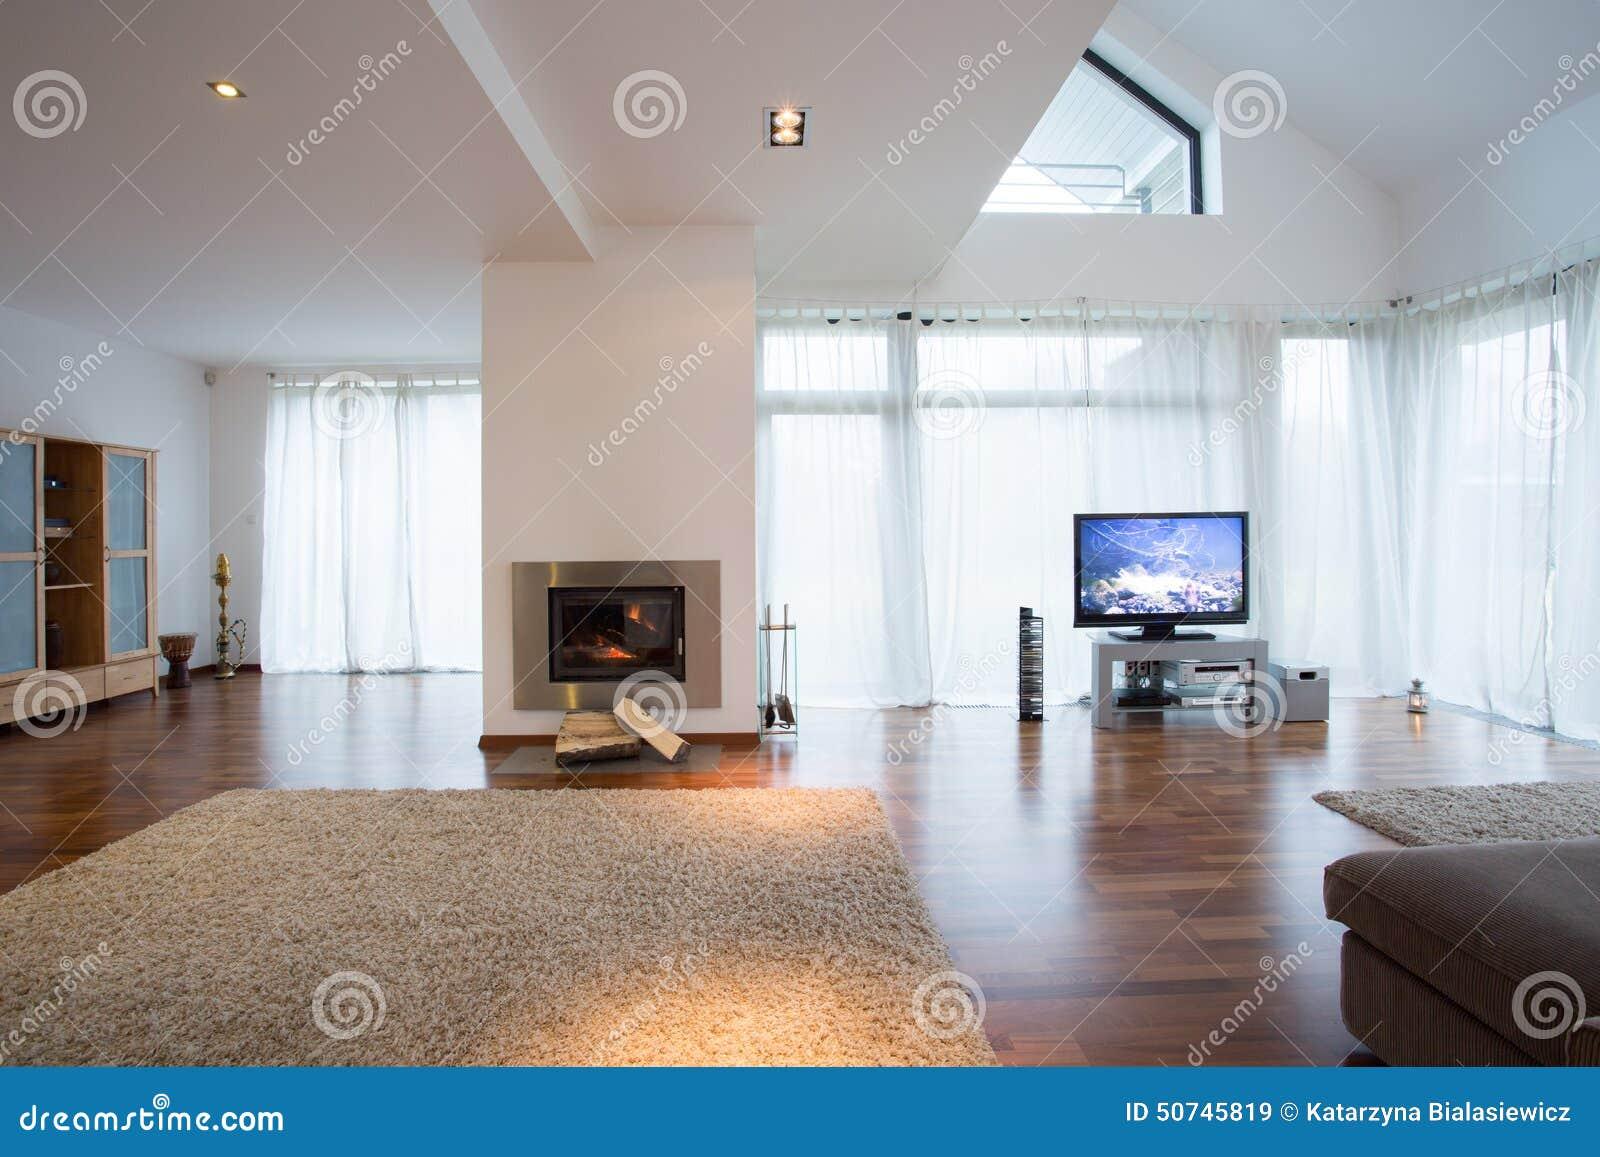 ms imgenes similares de sala de estar acogedora con la chimenea